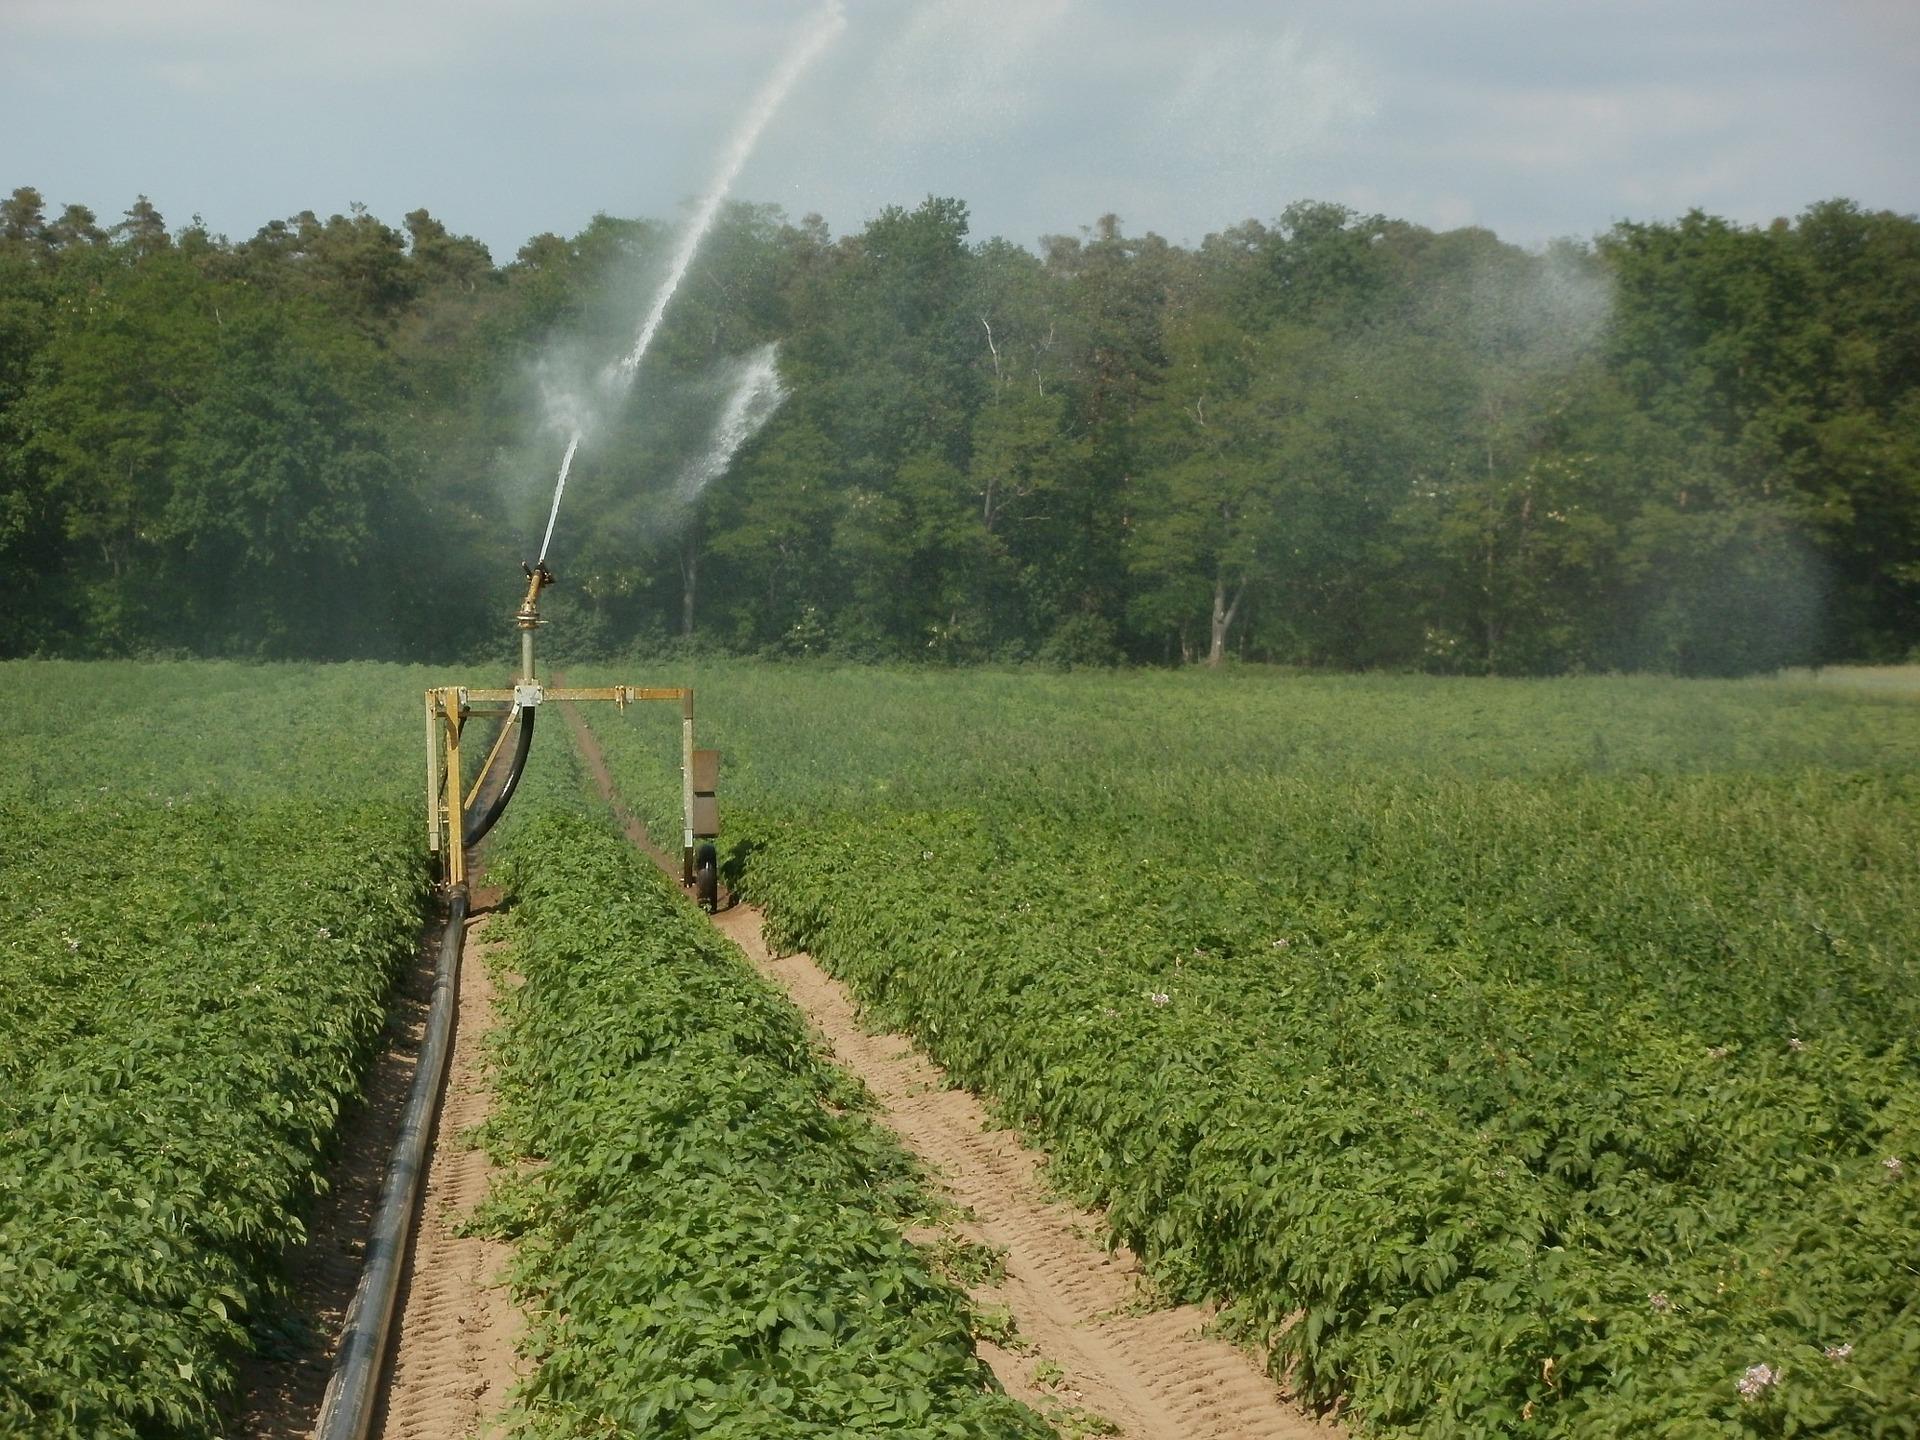 potato 839469 1920 - Άρδευση και ποιότητα καλλιέργειας